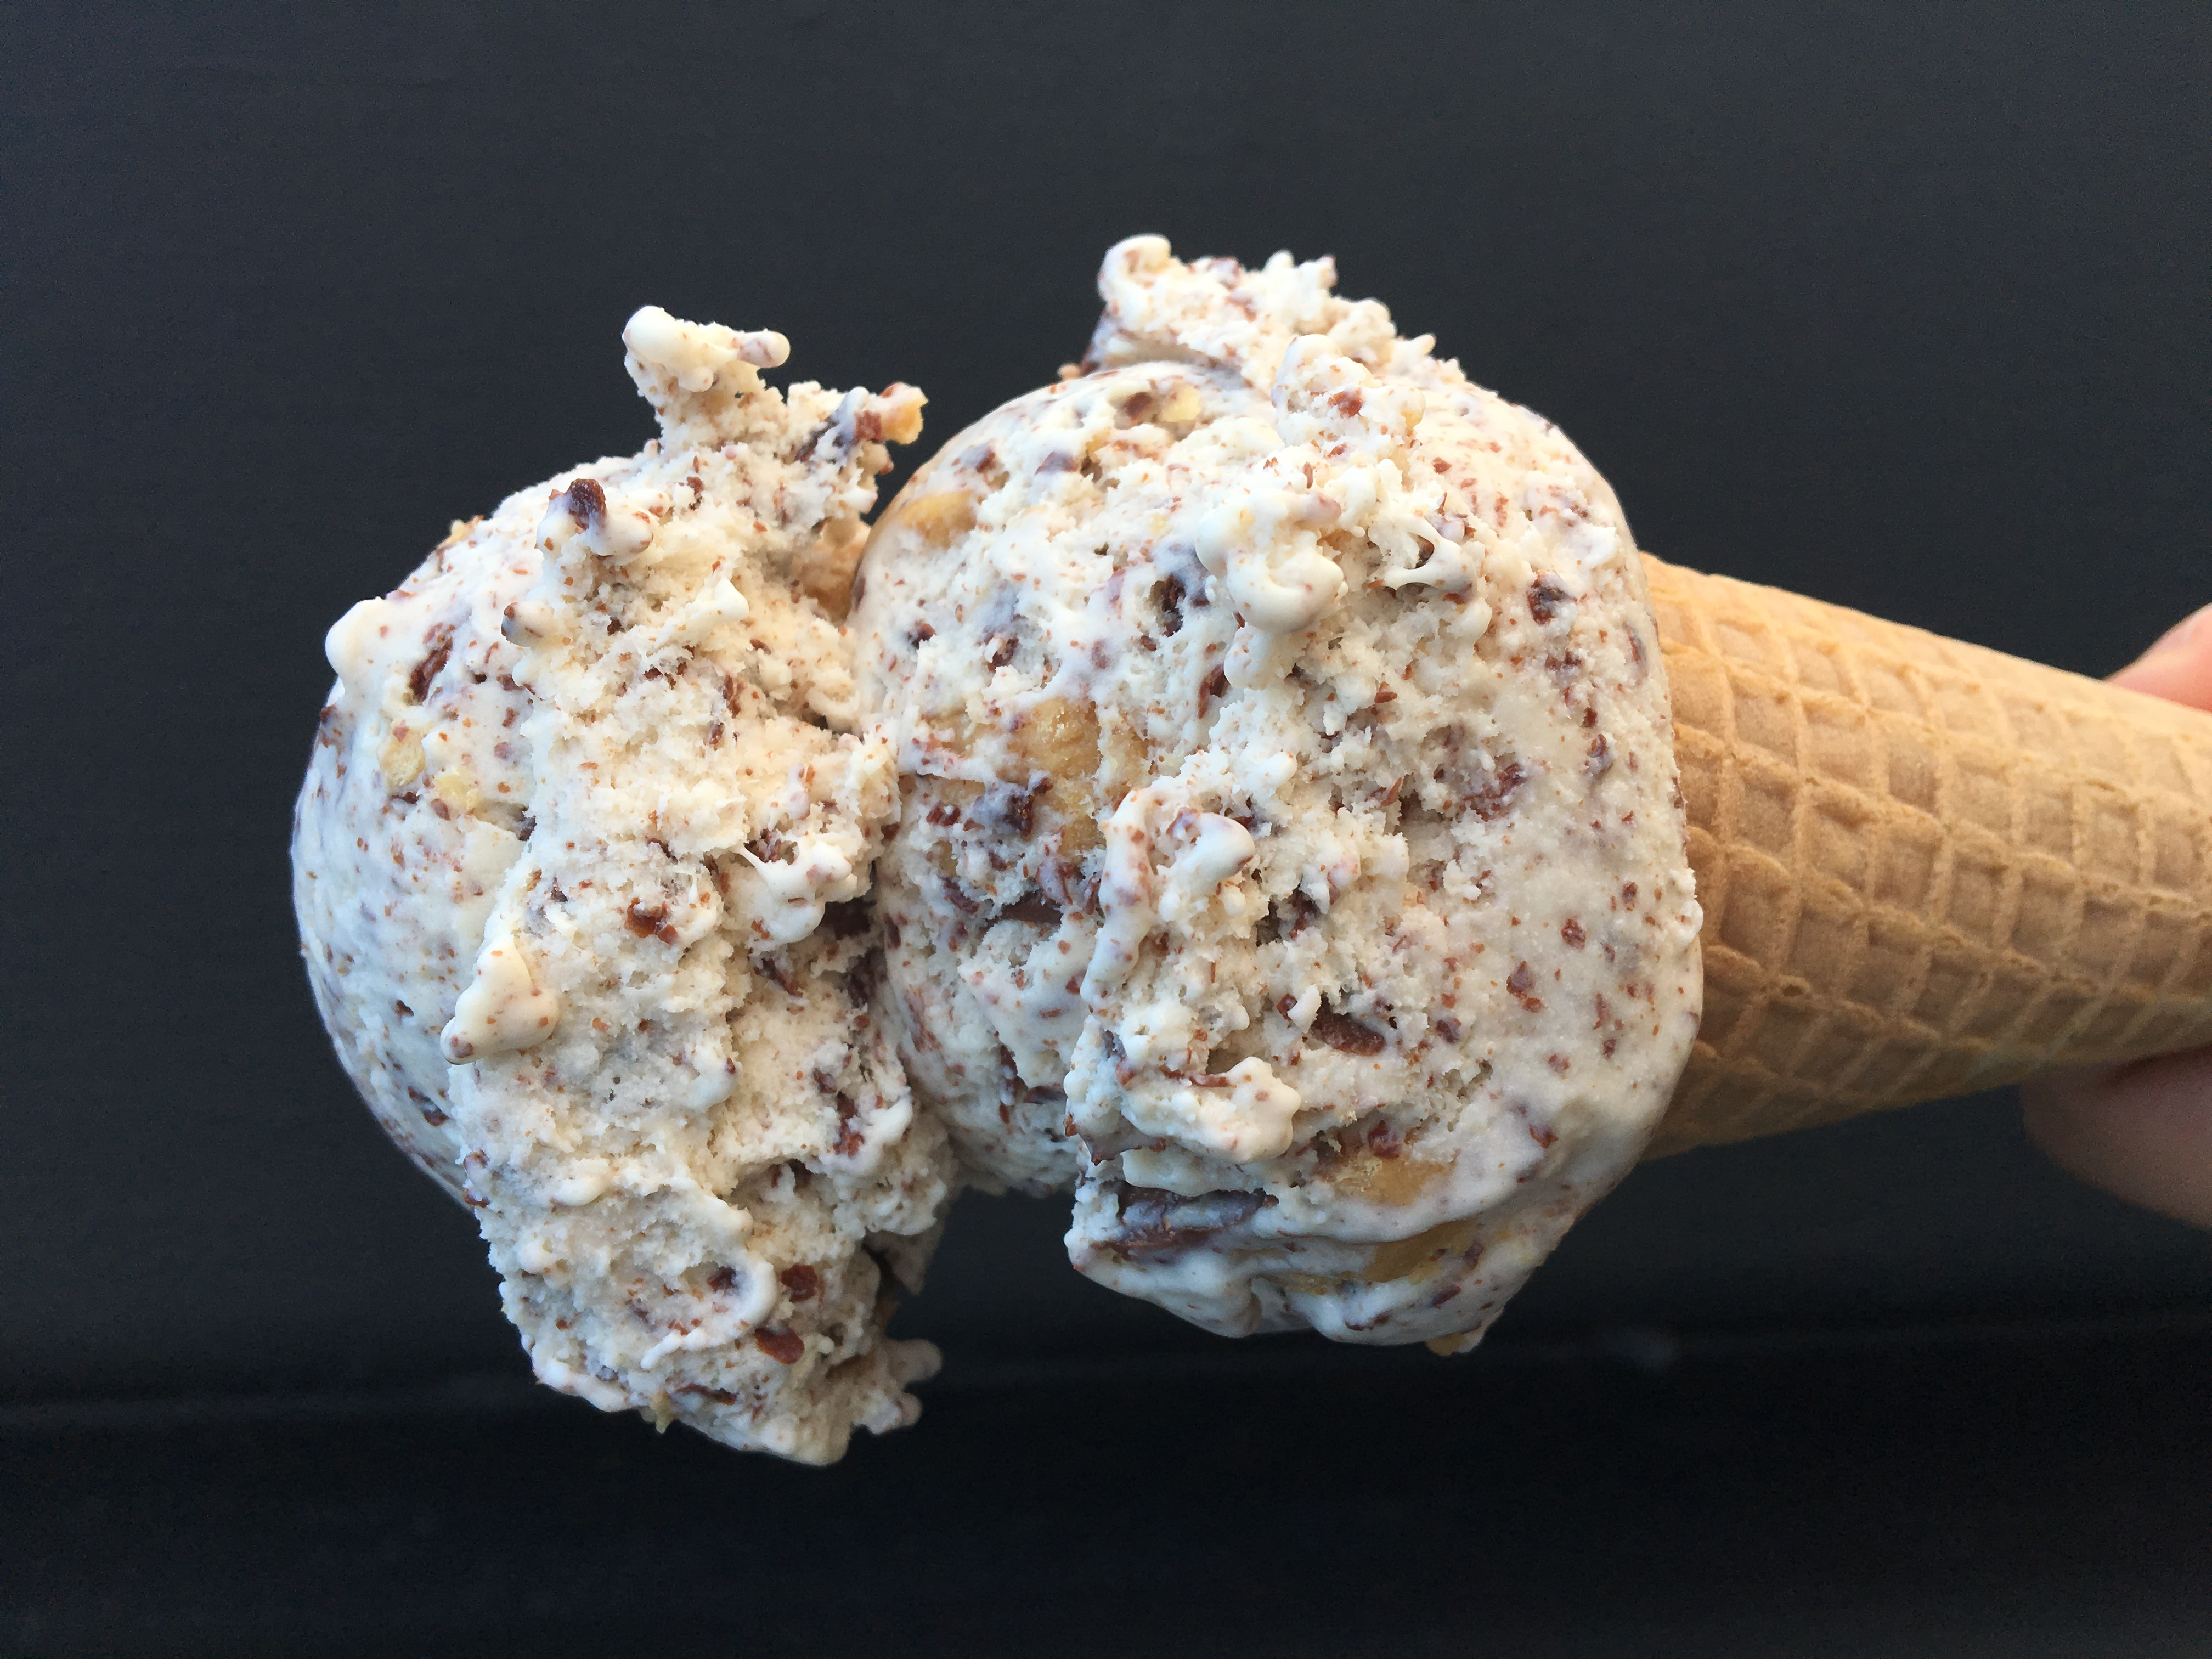 Ample Hills Creamery ice cream month